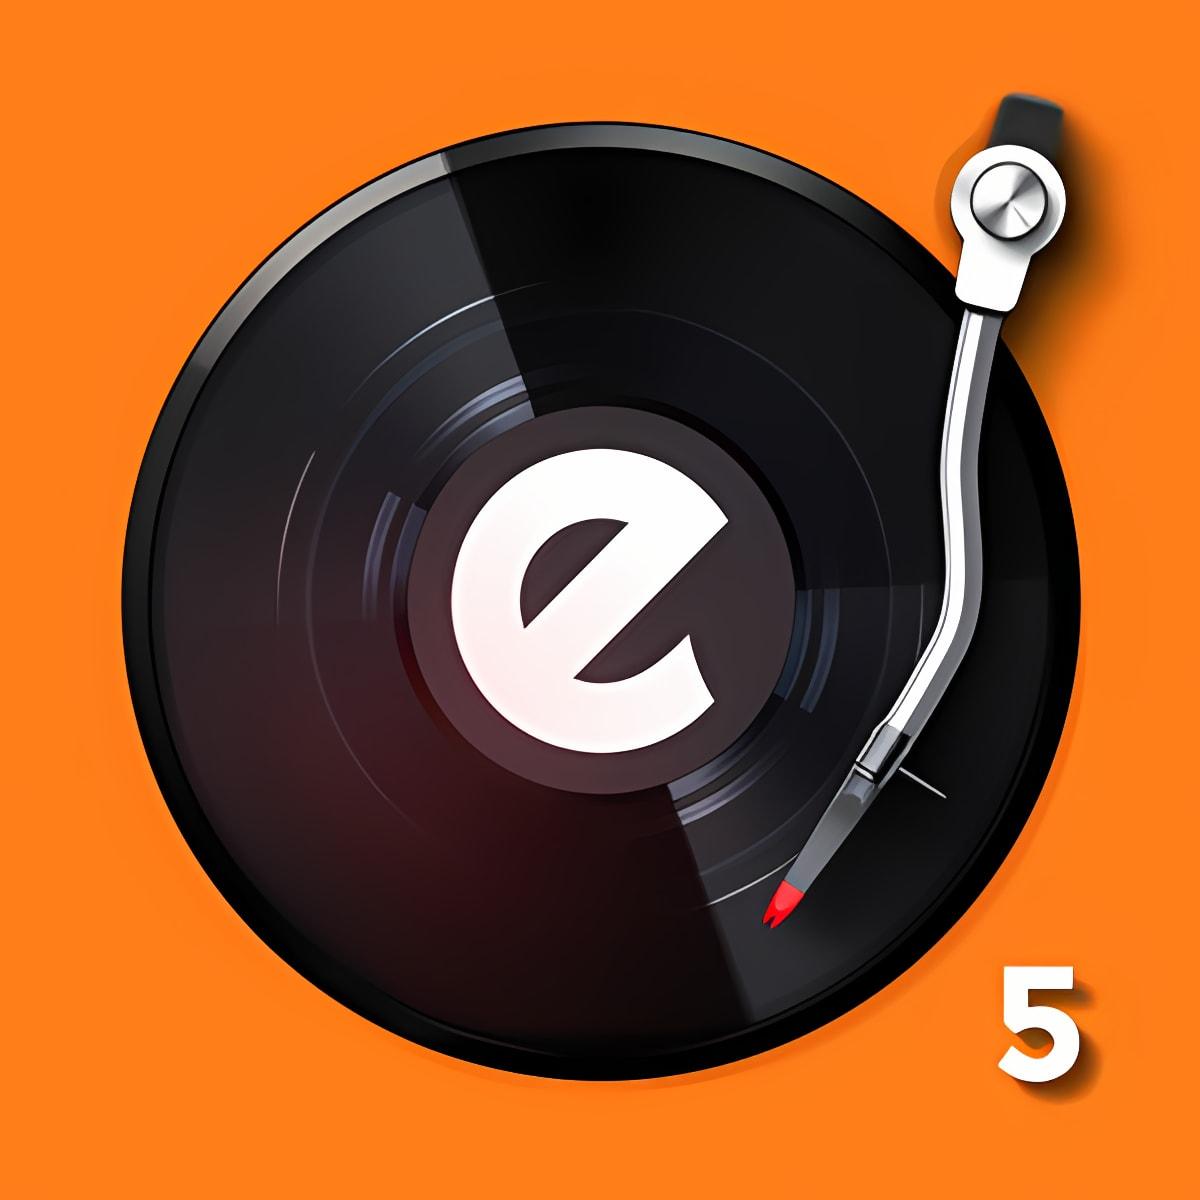 edjing 5DJ turntable to mix and record music-radio